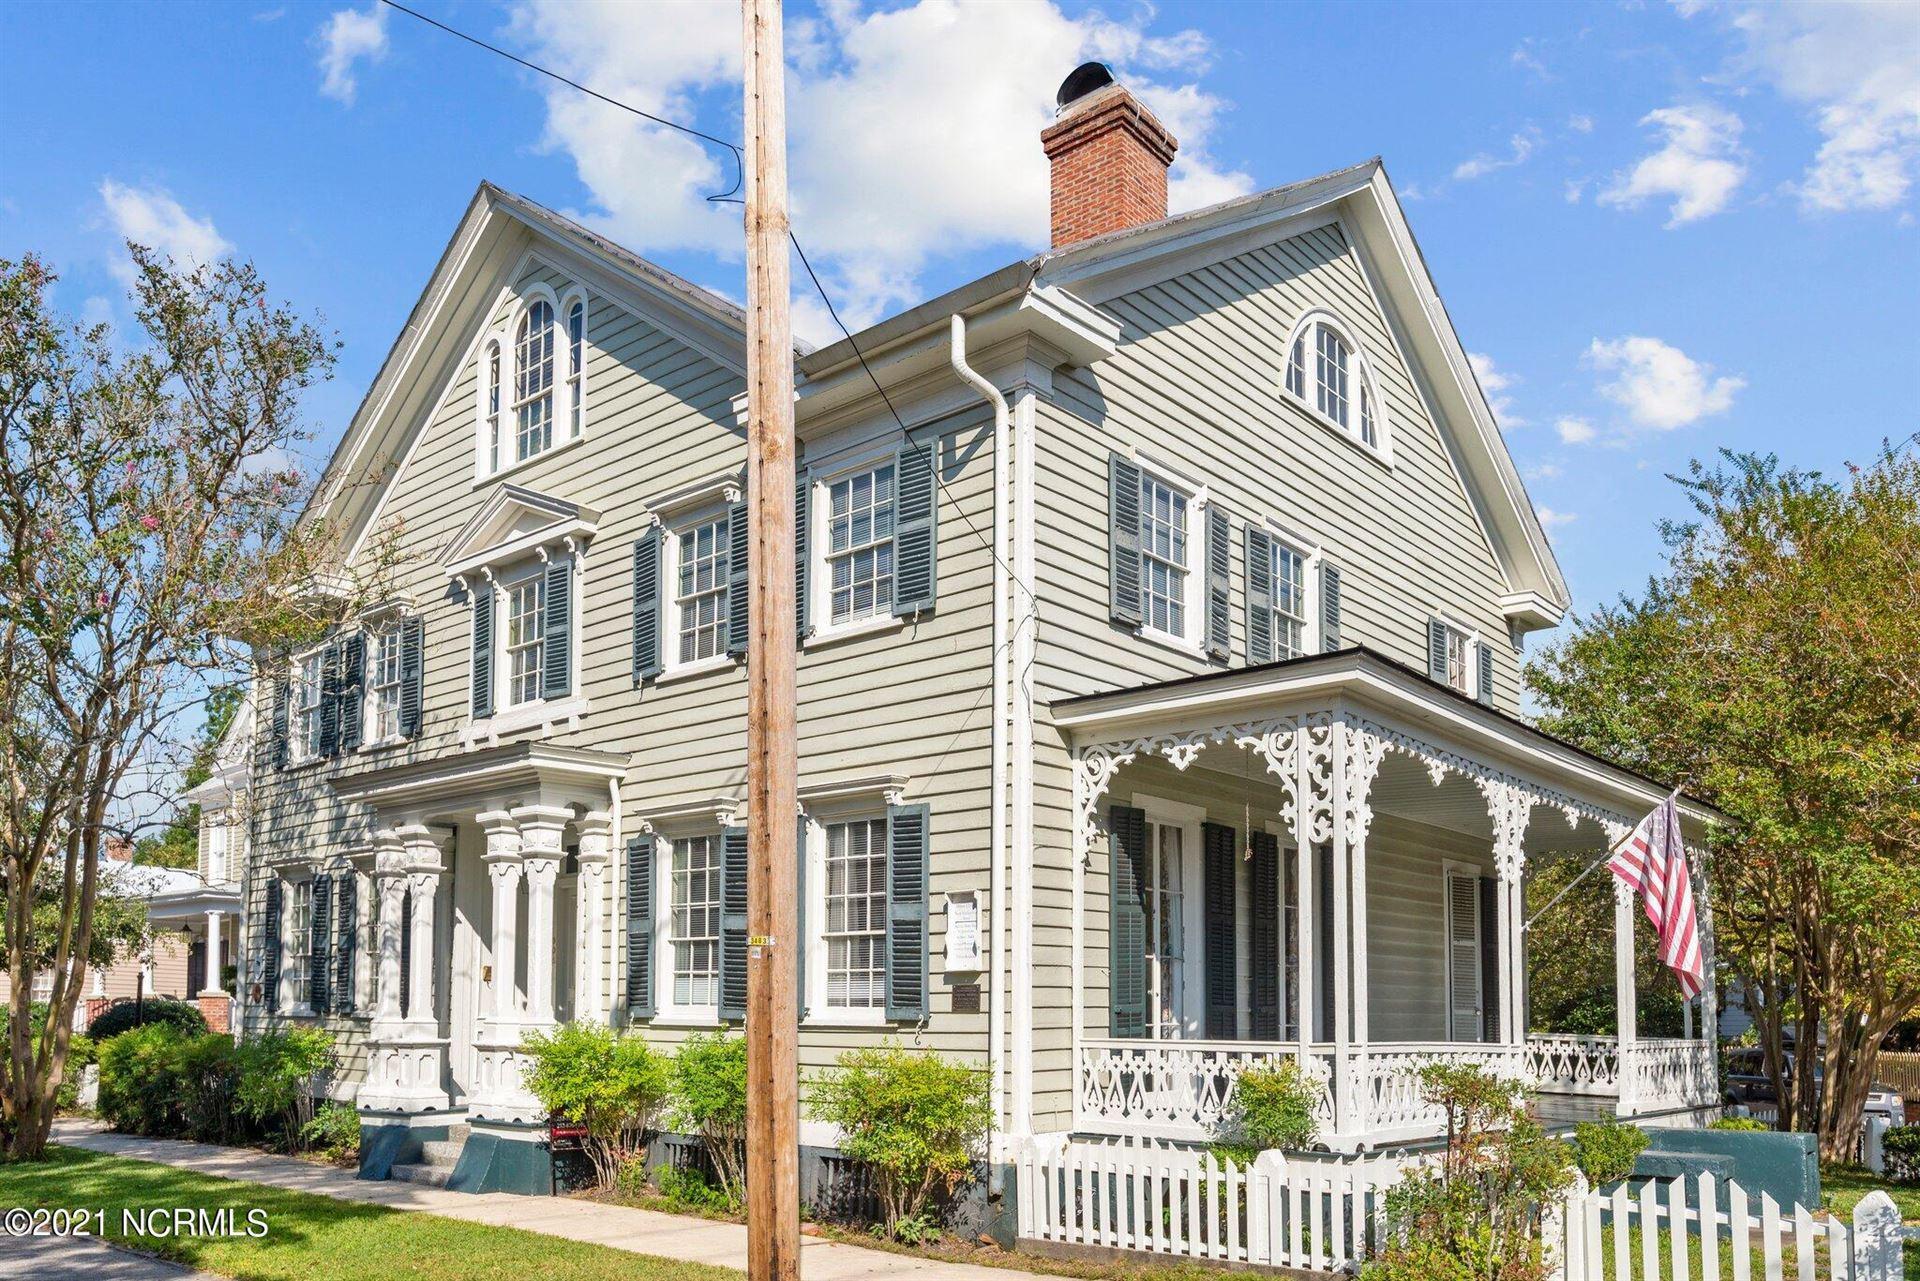 Photo of 506 Craven Street, New Bern, NC 28560 (MLS # 100273880)